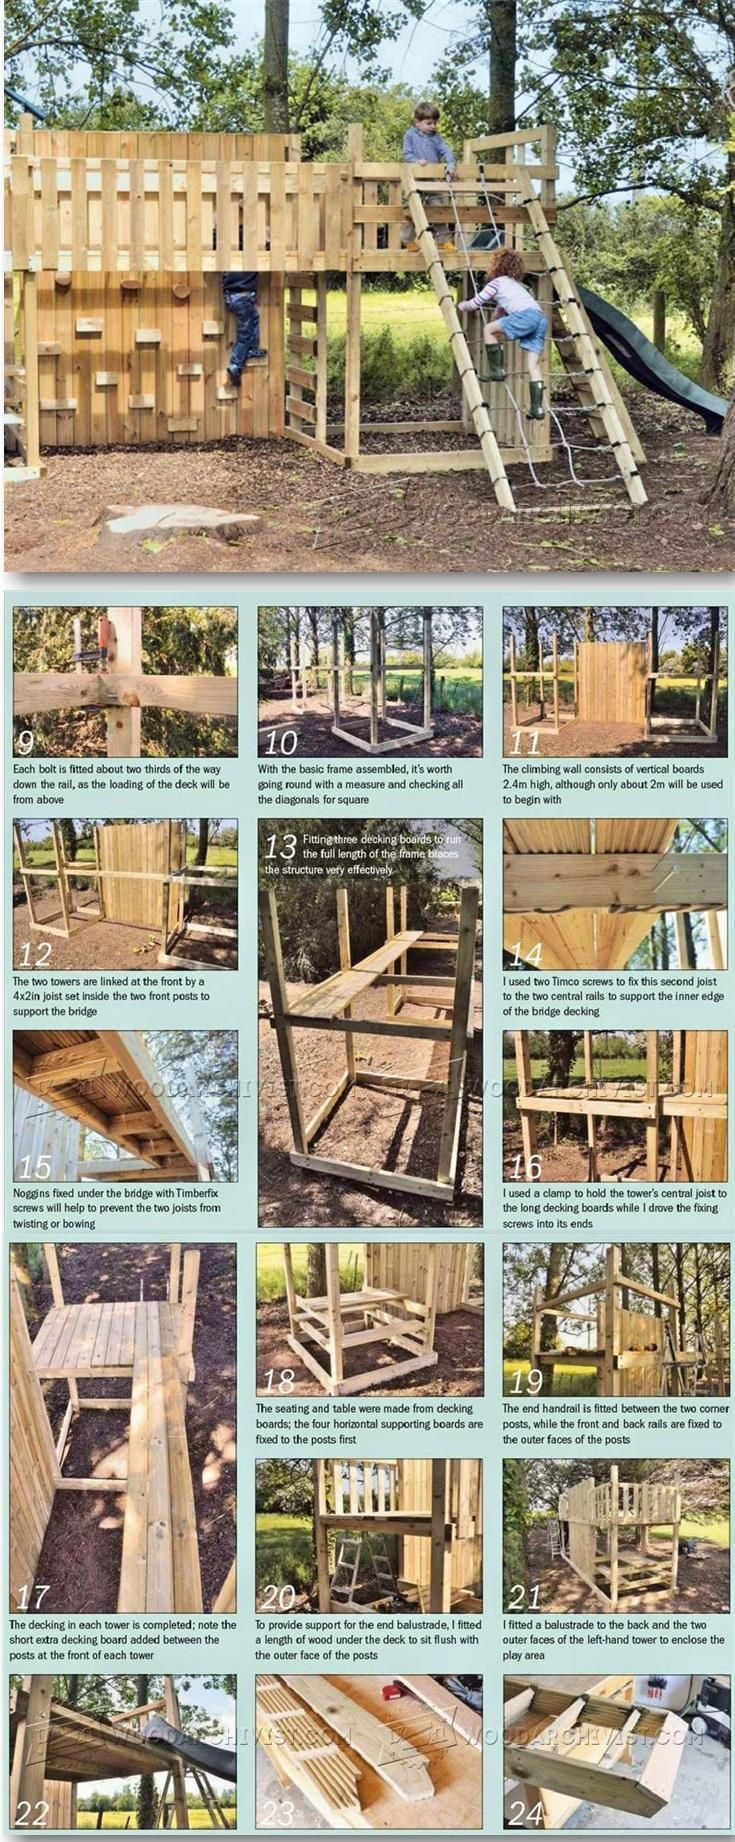 Kids Climbing Frame Plans - Children's Outdoor Plans and Projects | http://WoodArchivist.com